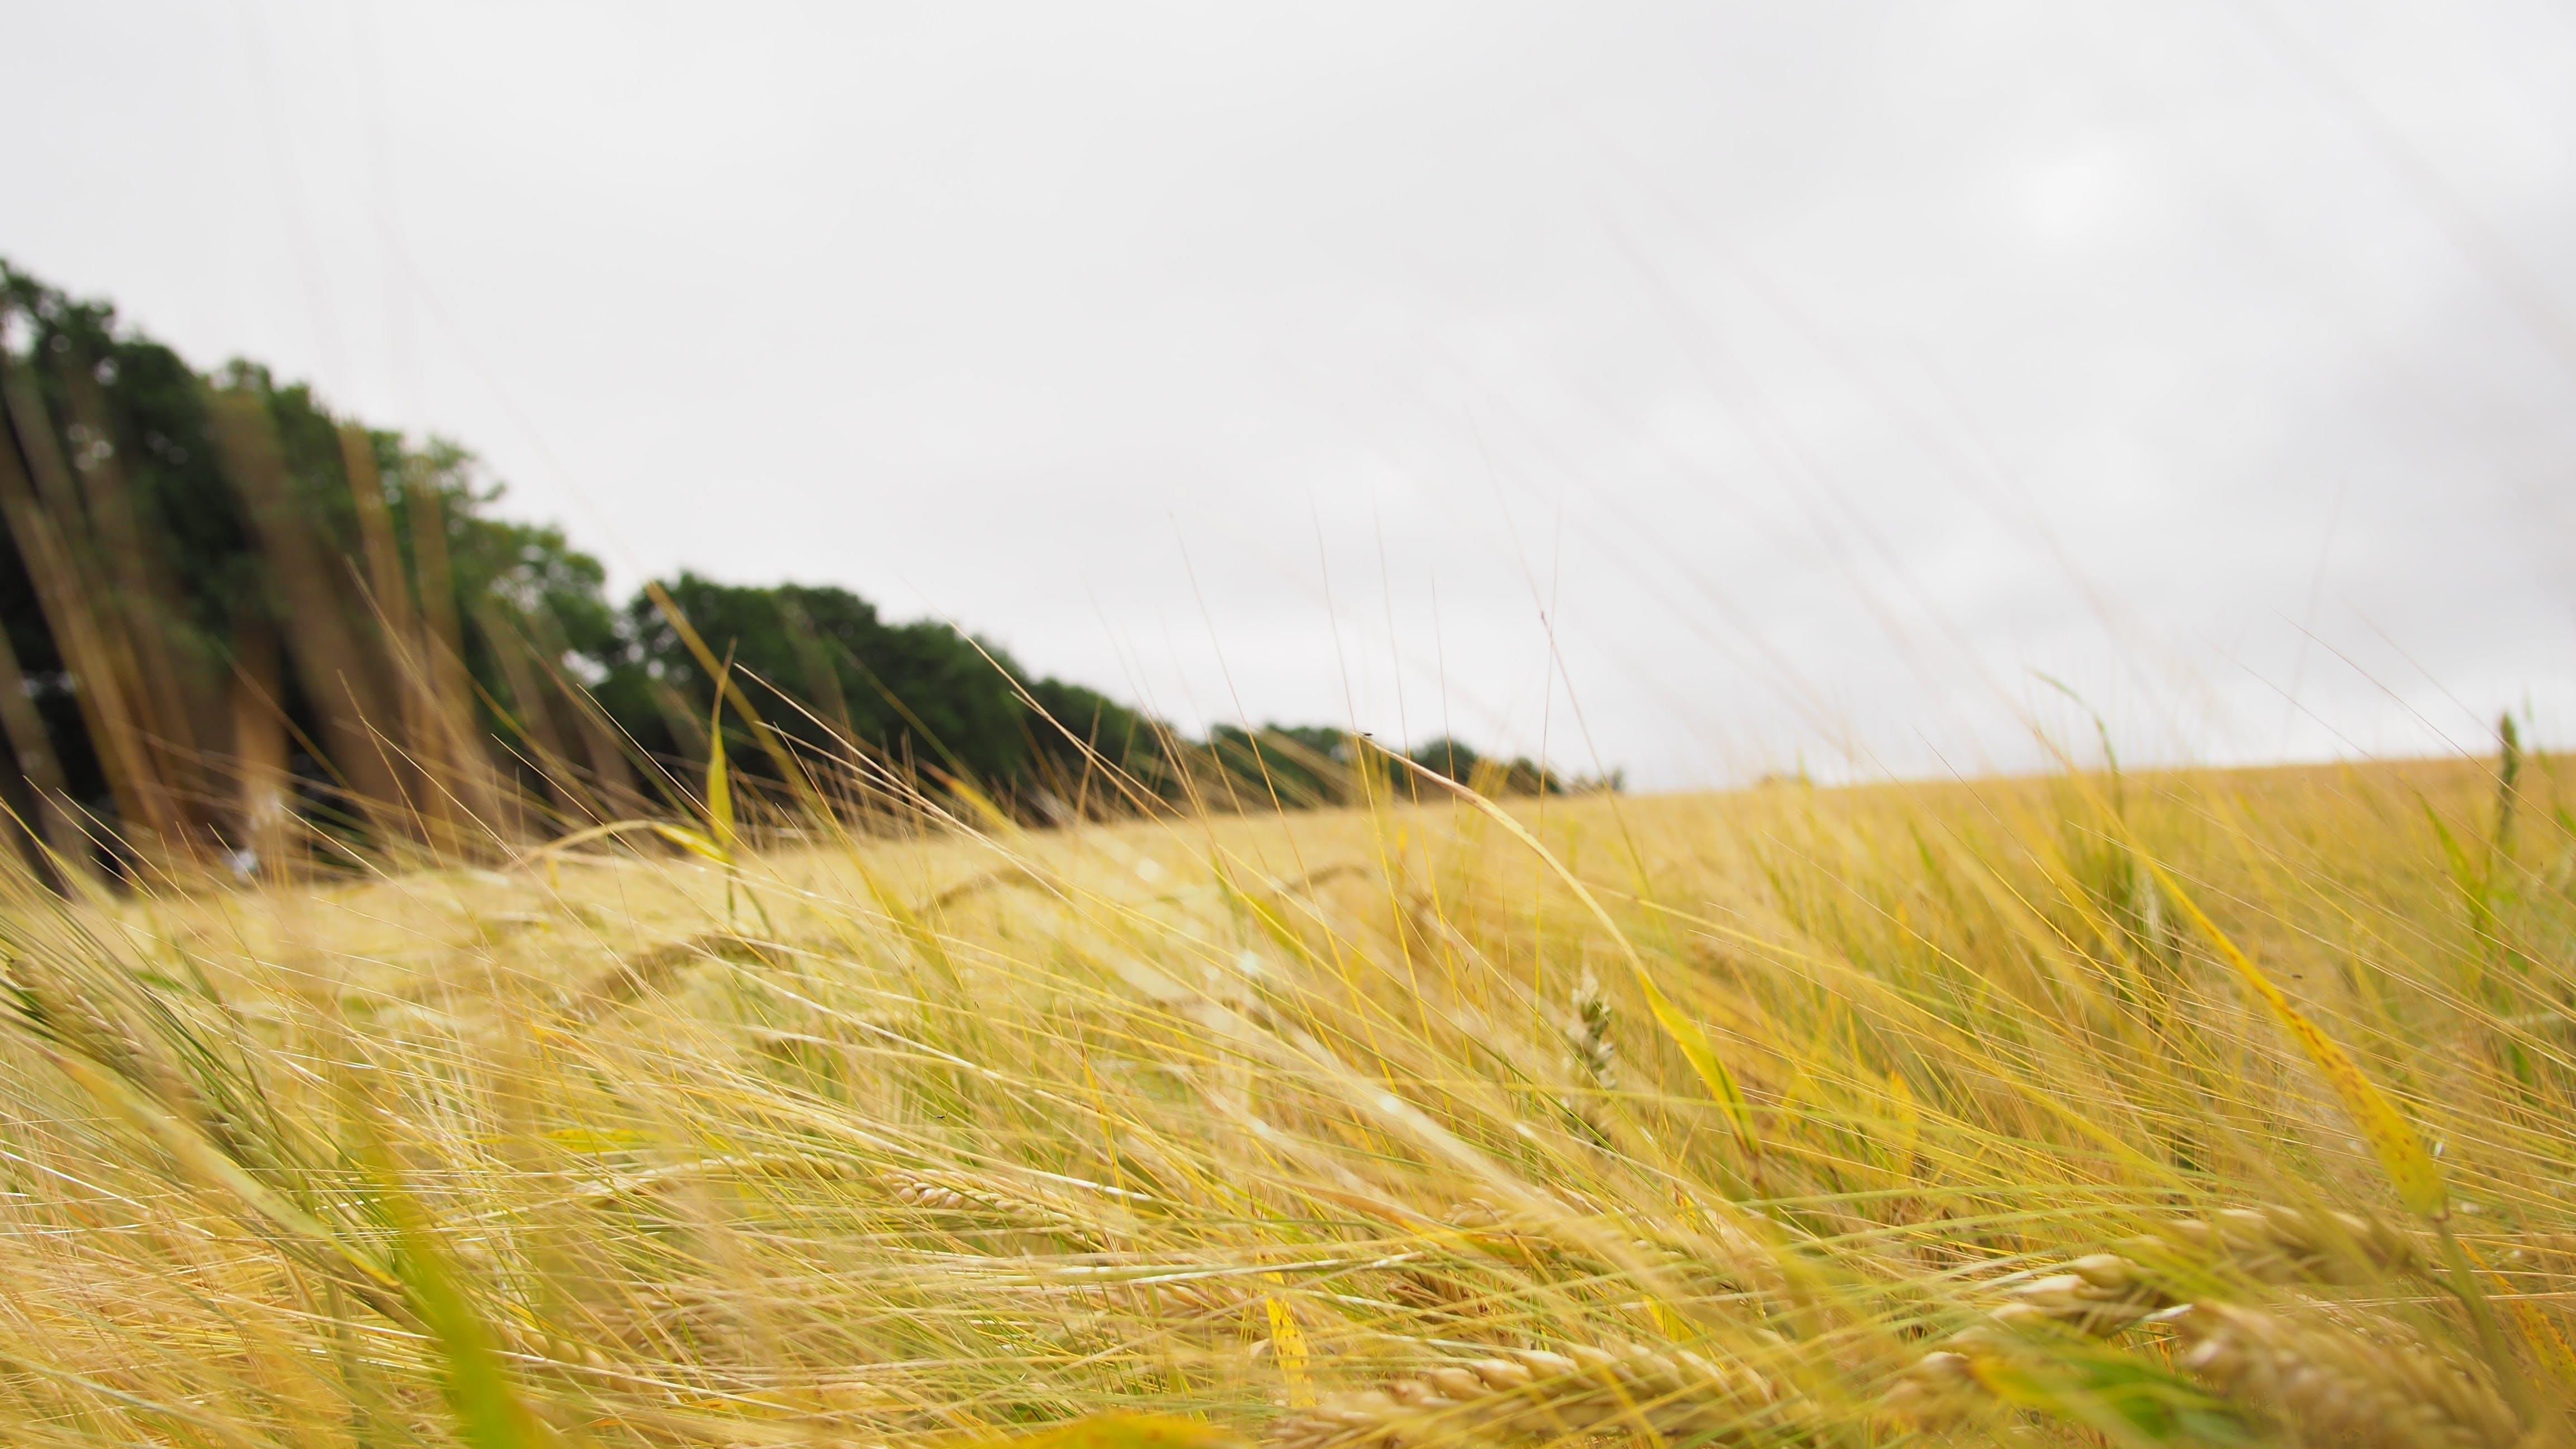 Free stock photo of corn field, field